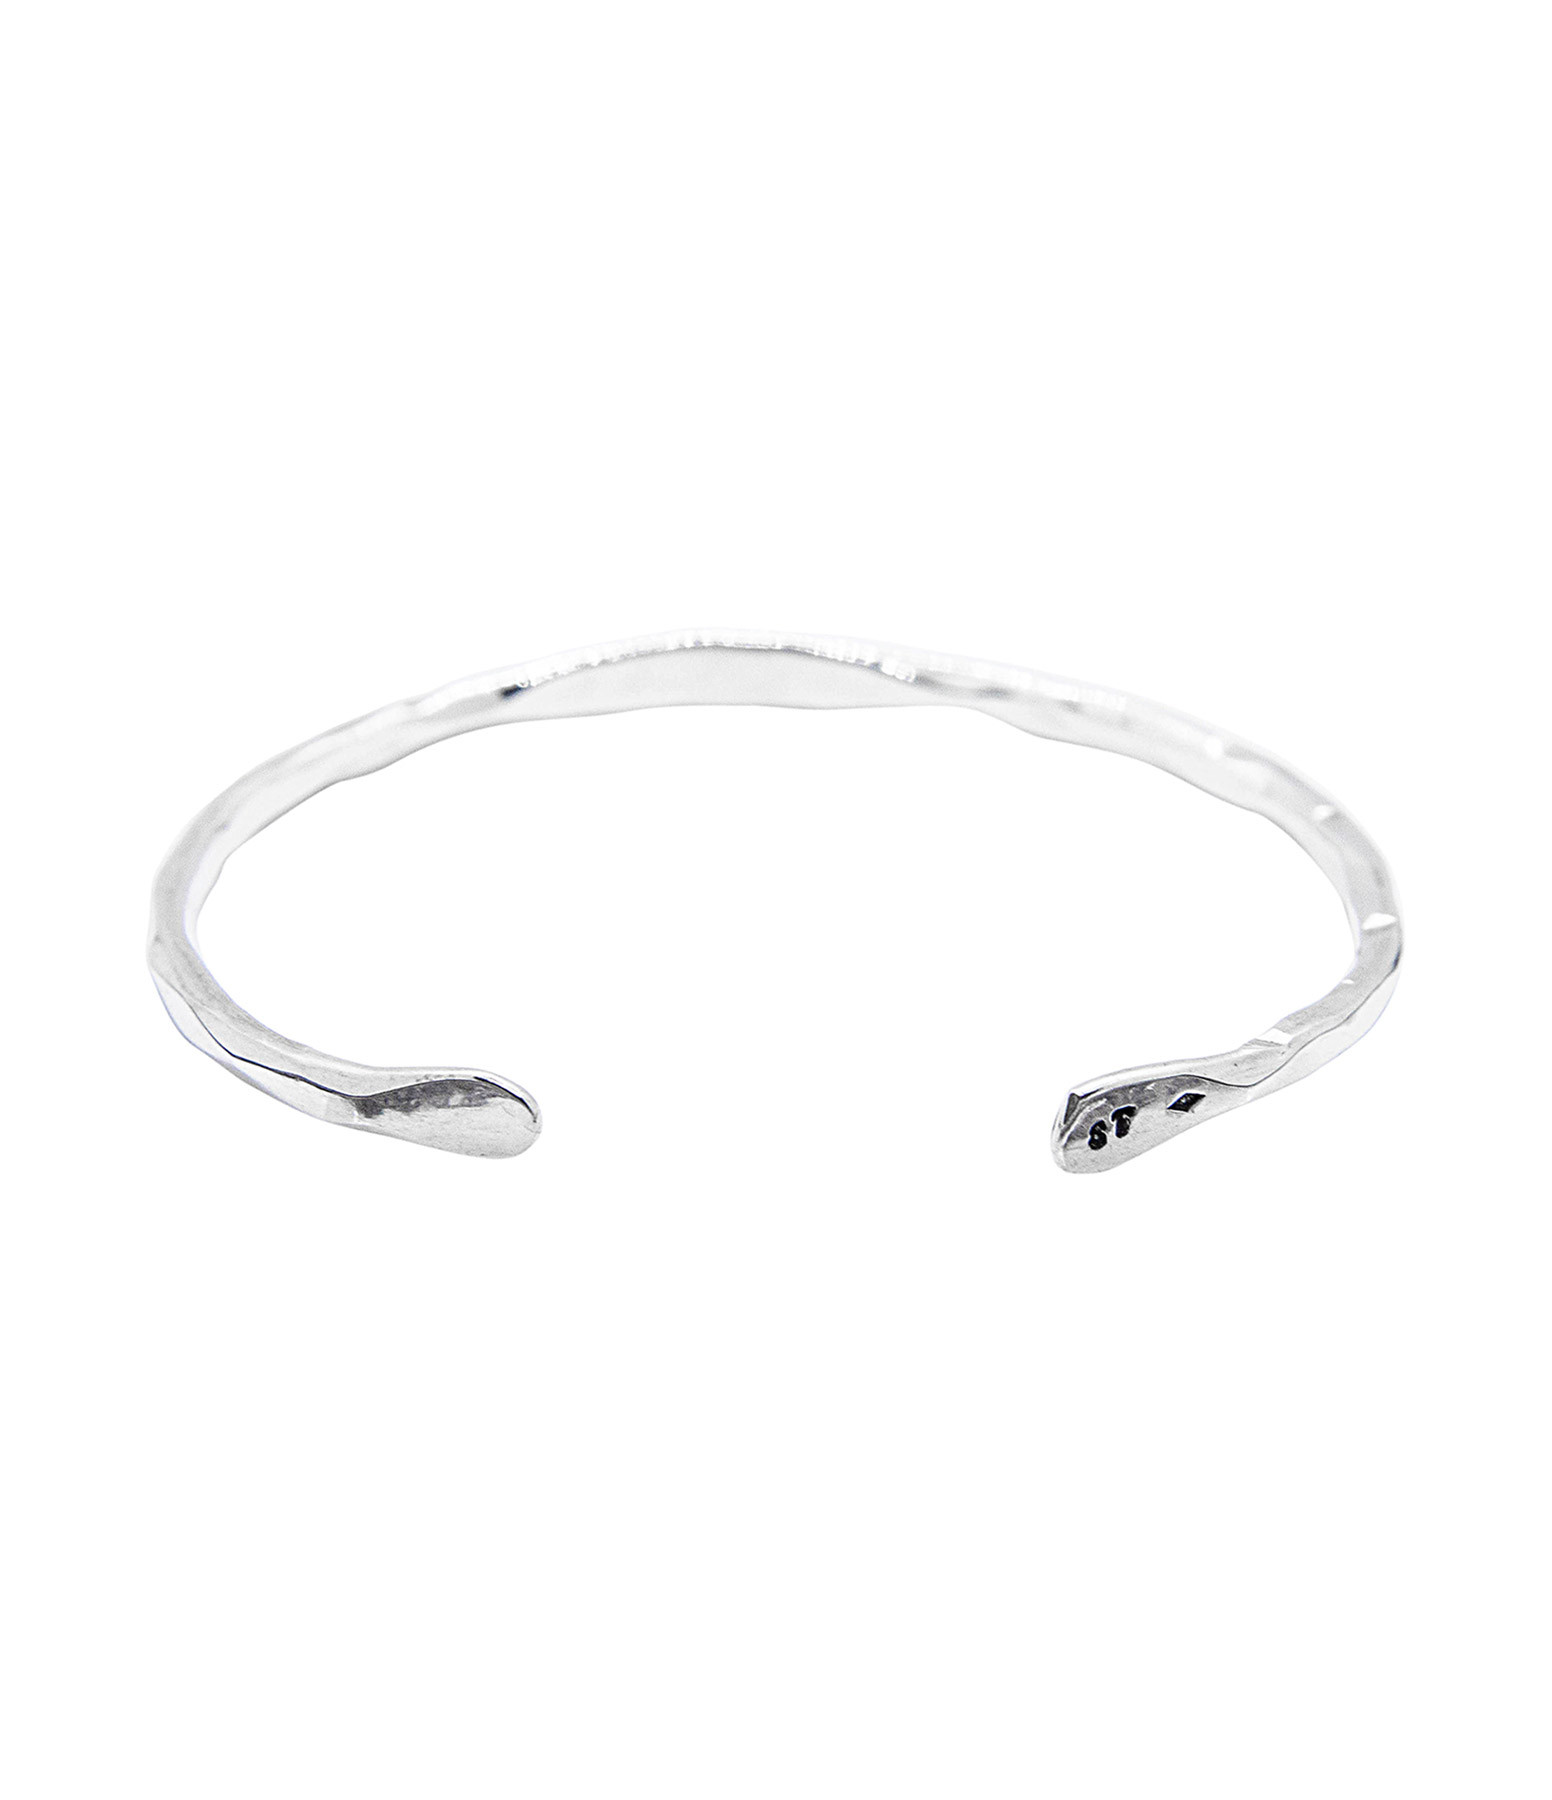 SERGE THORAVAL - Bracelet Toujours Argent